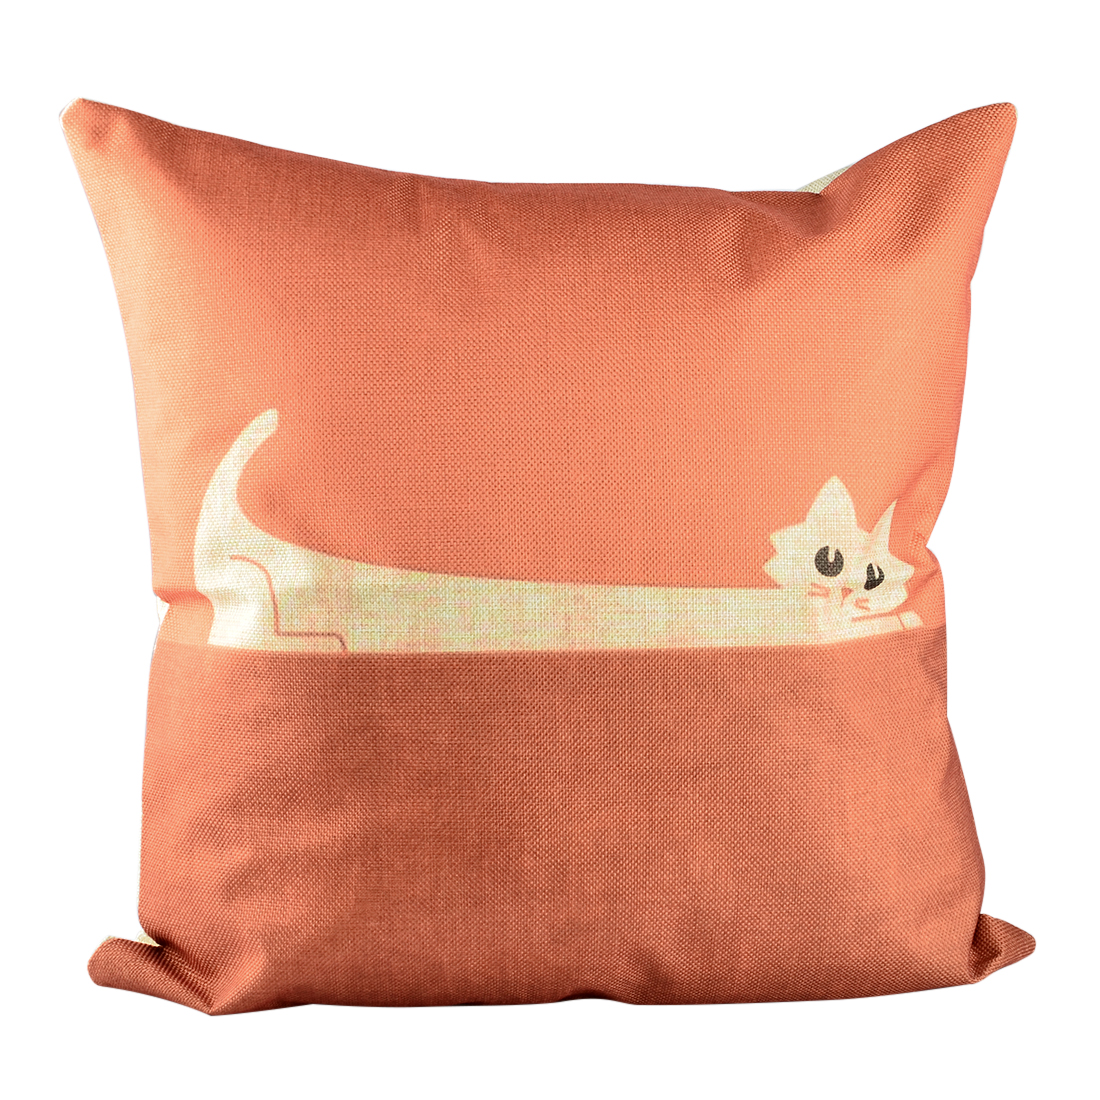 Cotton Linen Decorative Pillow Cover Pillowcase Pillowslip Orange Cat Pattern Square... by